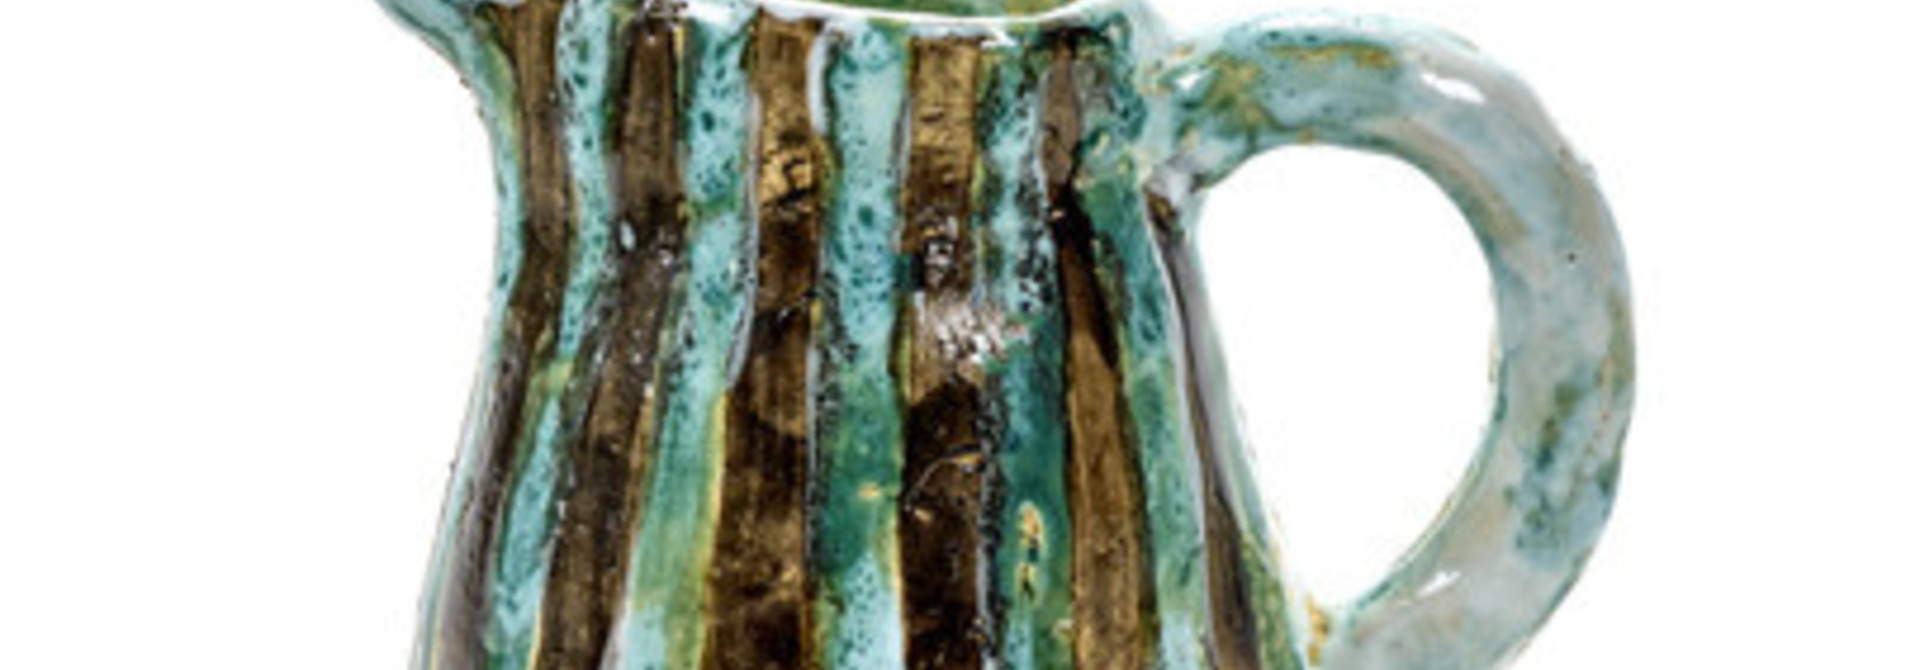 Oui Oui Decorative Jug - Blue/Green